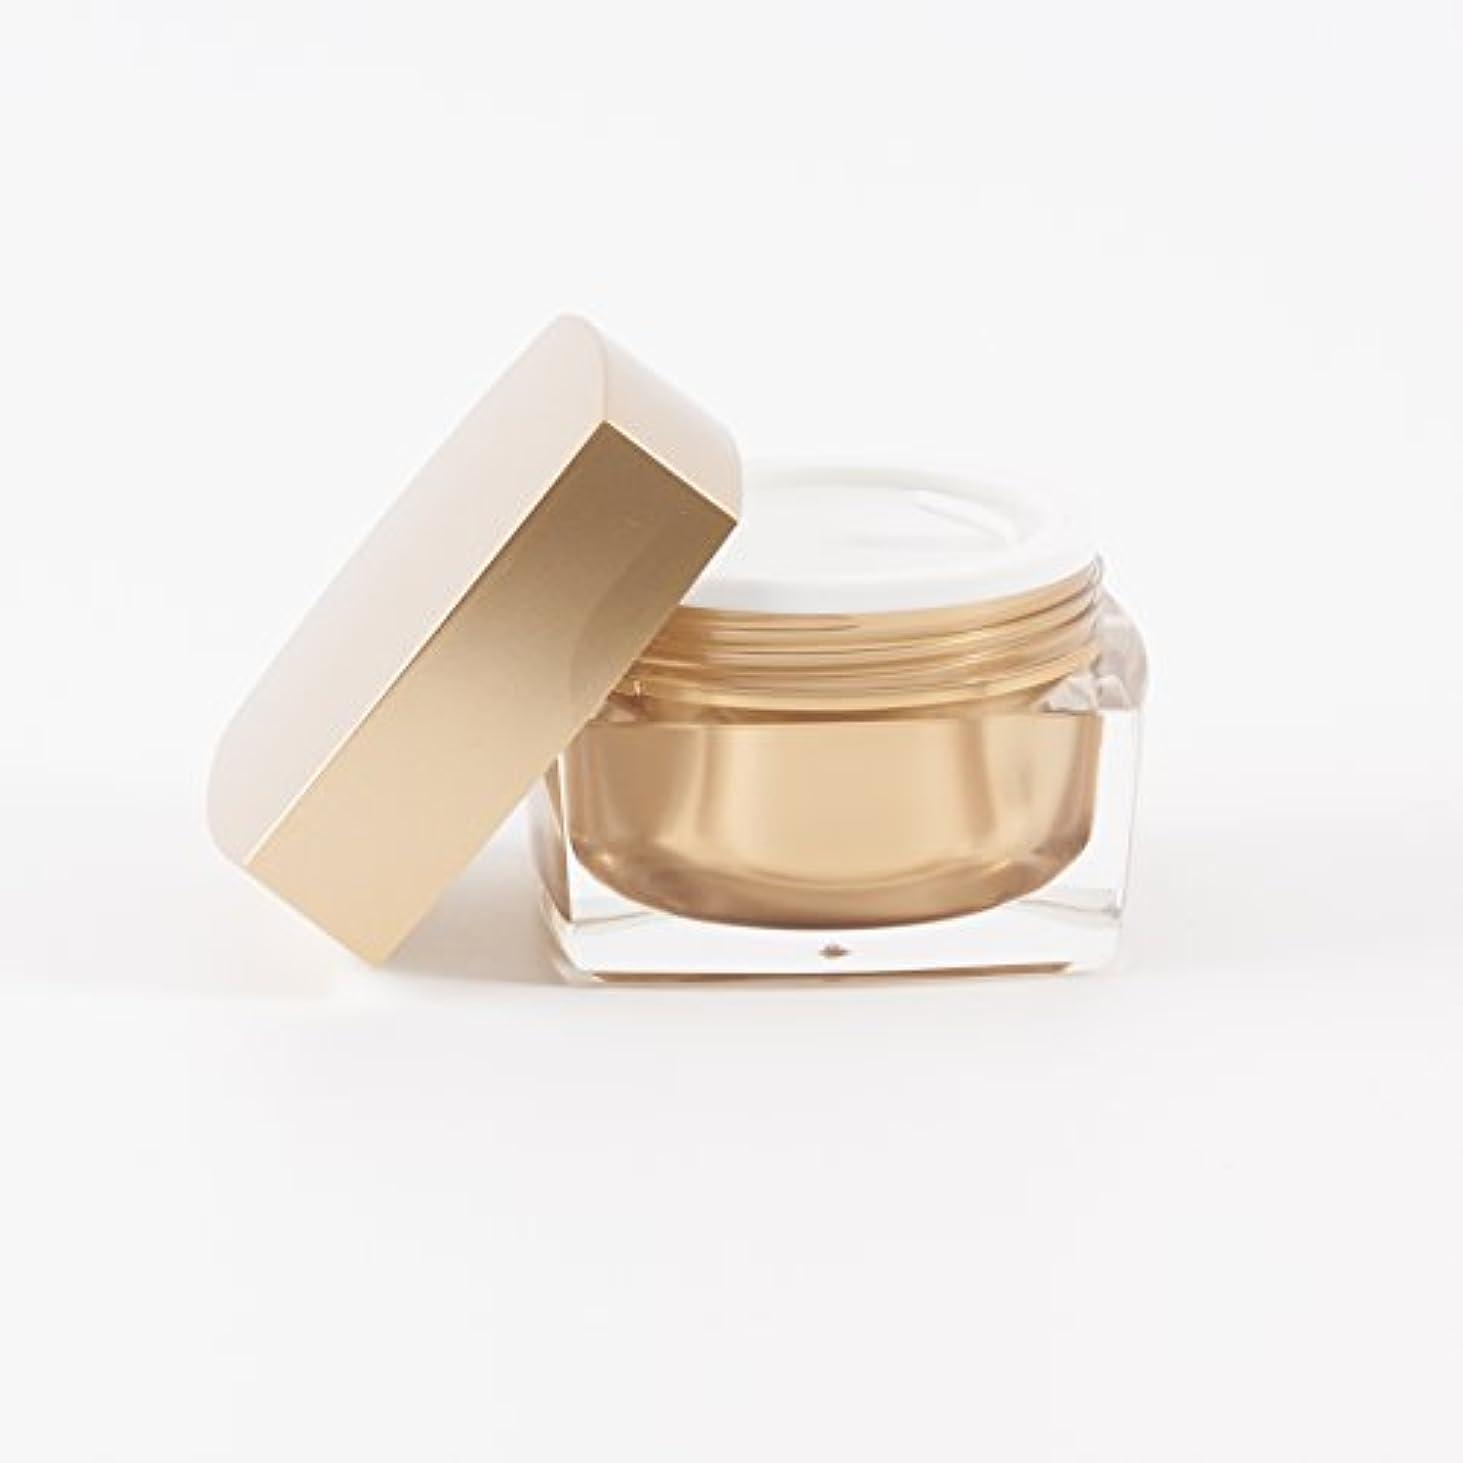 原子炉キモい相続人Verve Acrylic Jar Gold 50ml x 10